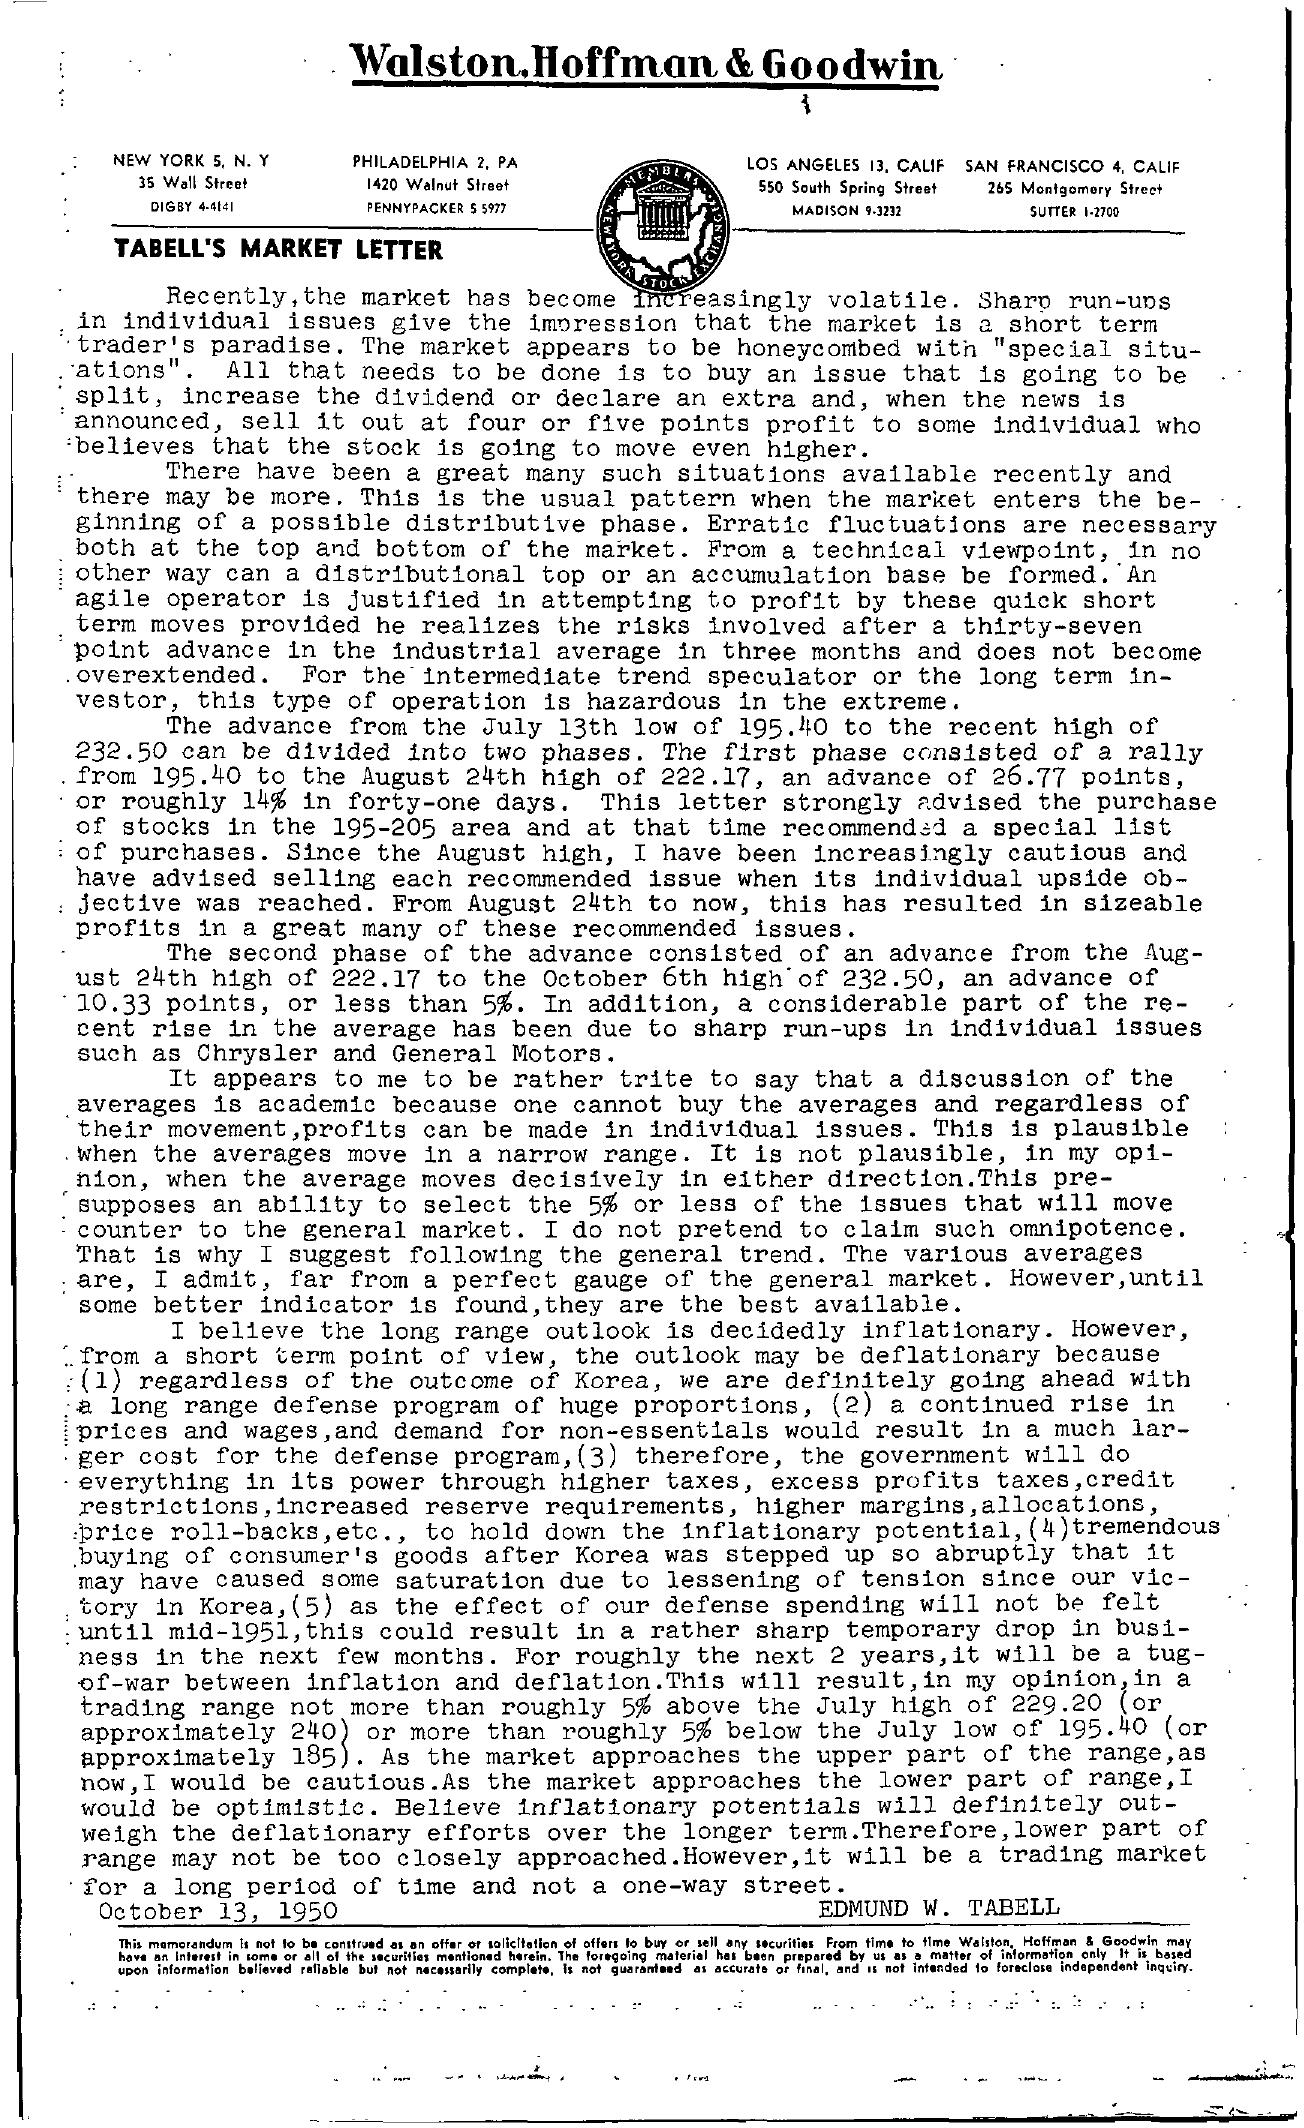 Tabell's Market Letter - October 13, 1950